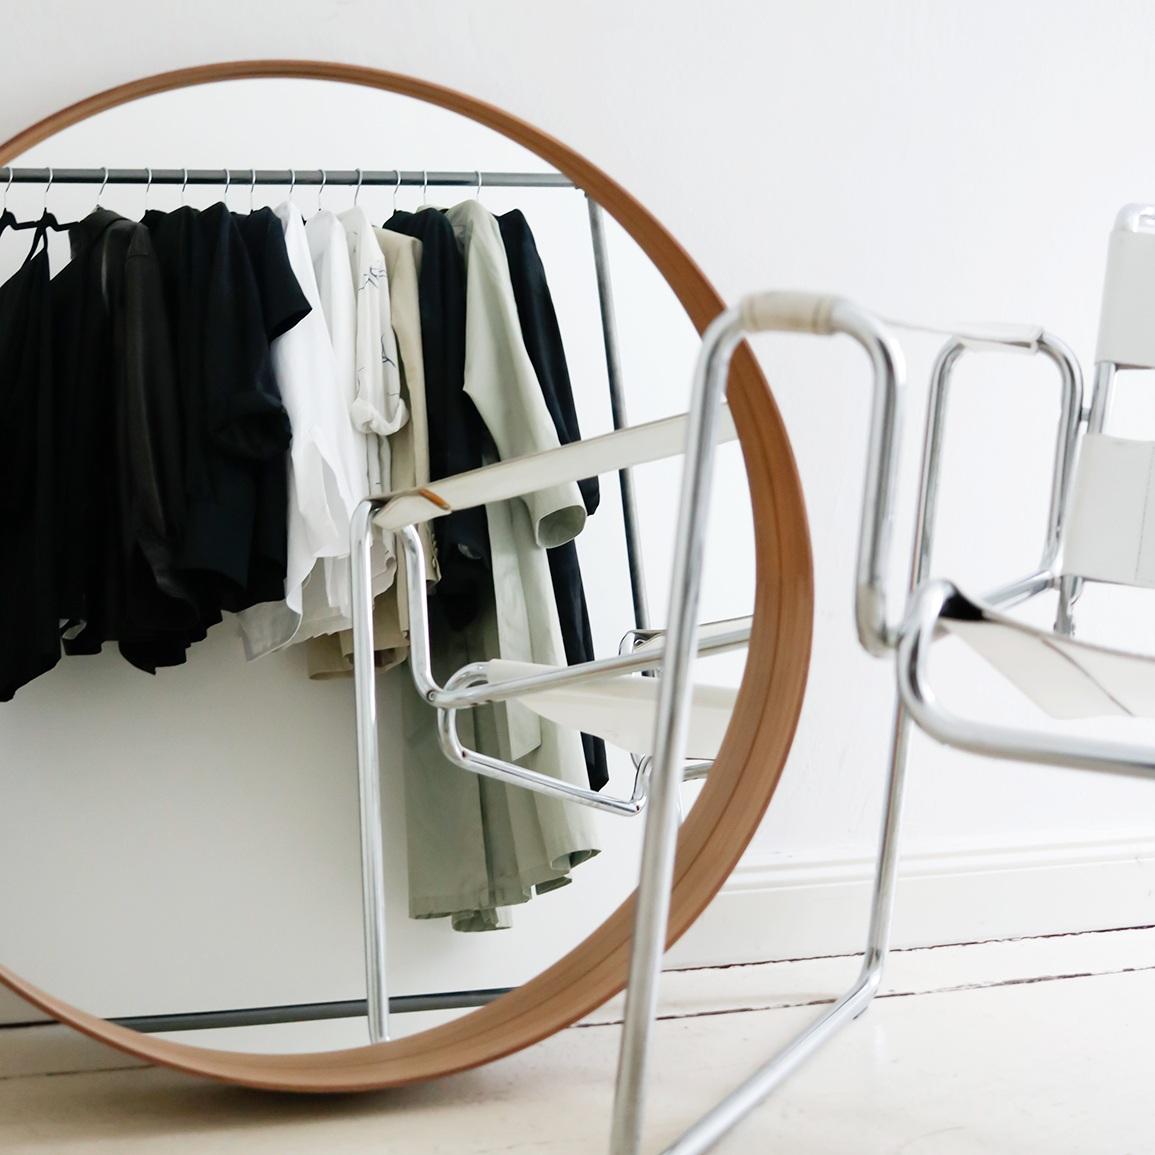 noanoir-how-to-create-a-capsule-wardrobe